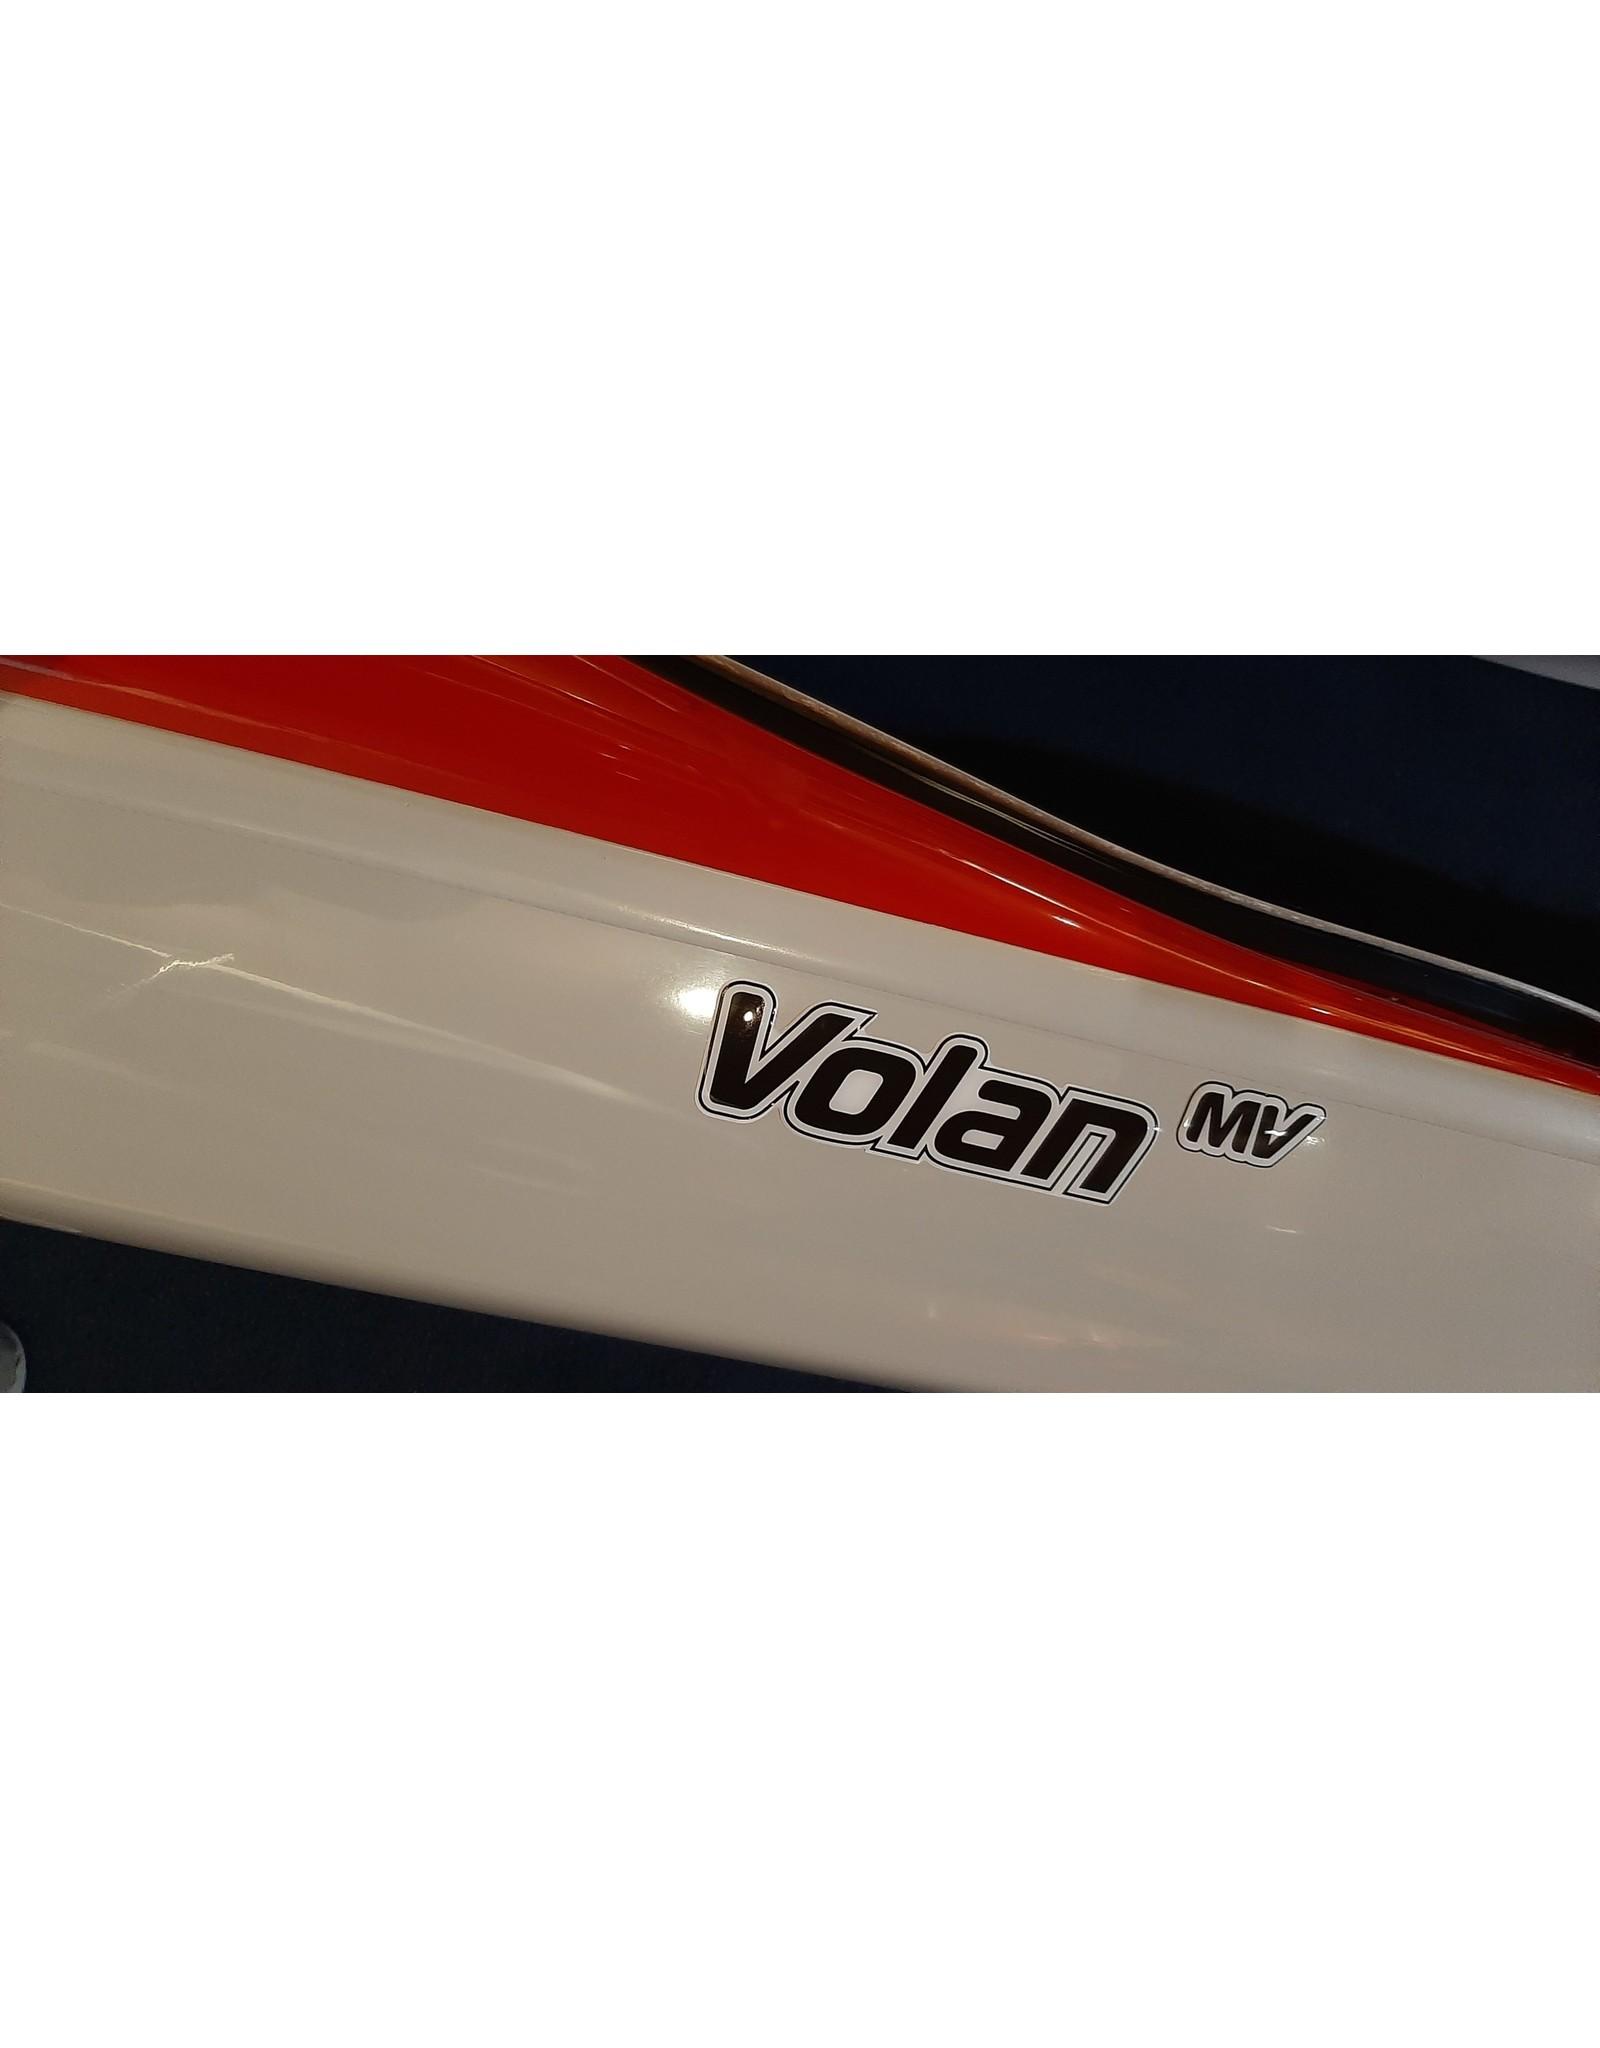 P&H Custom Sea Kayaks P&H kayak Volan MV Performance Kevlar/Diolen rouge/lime/gris pâle